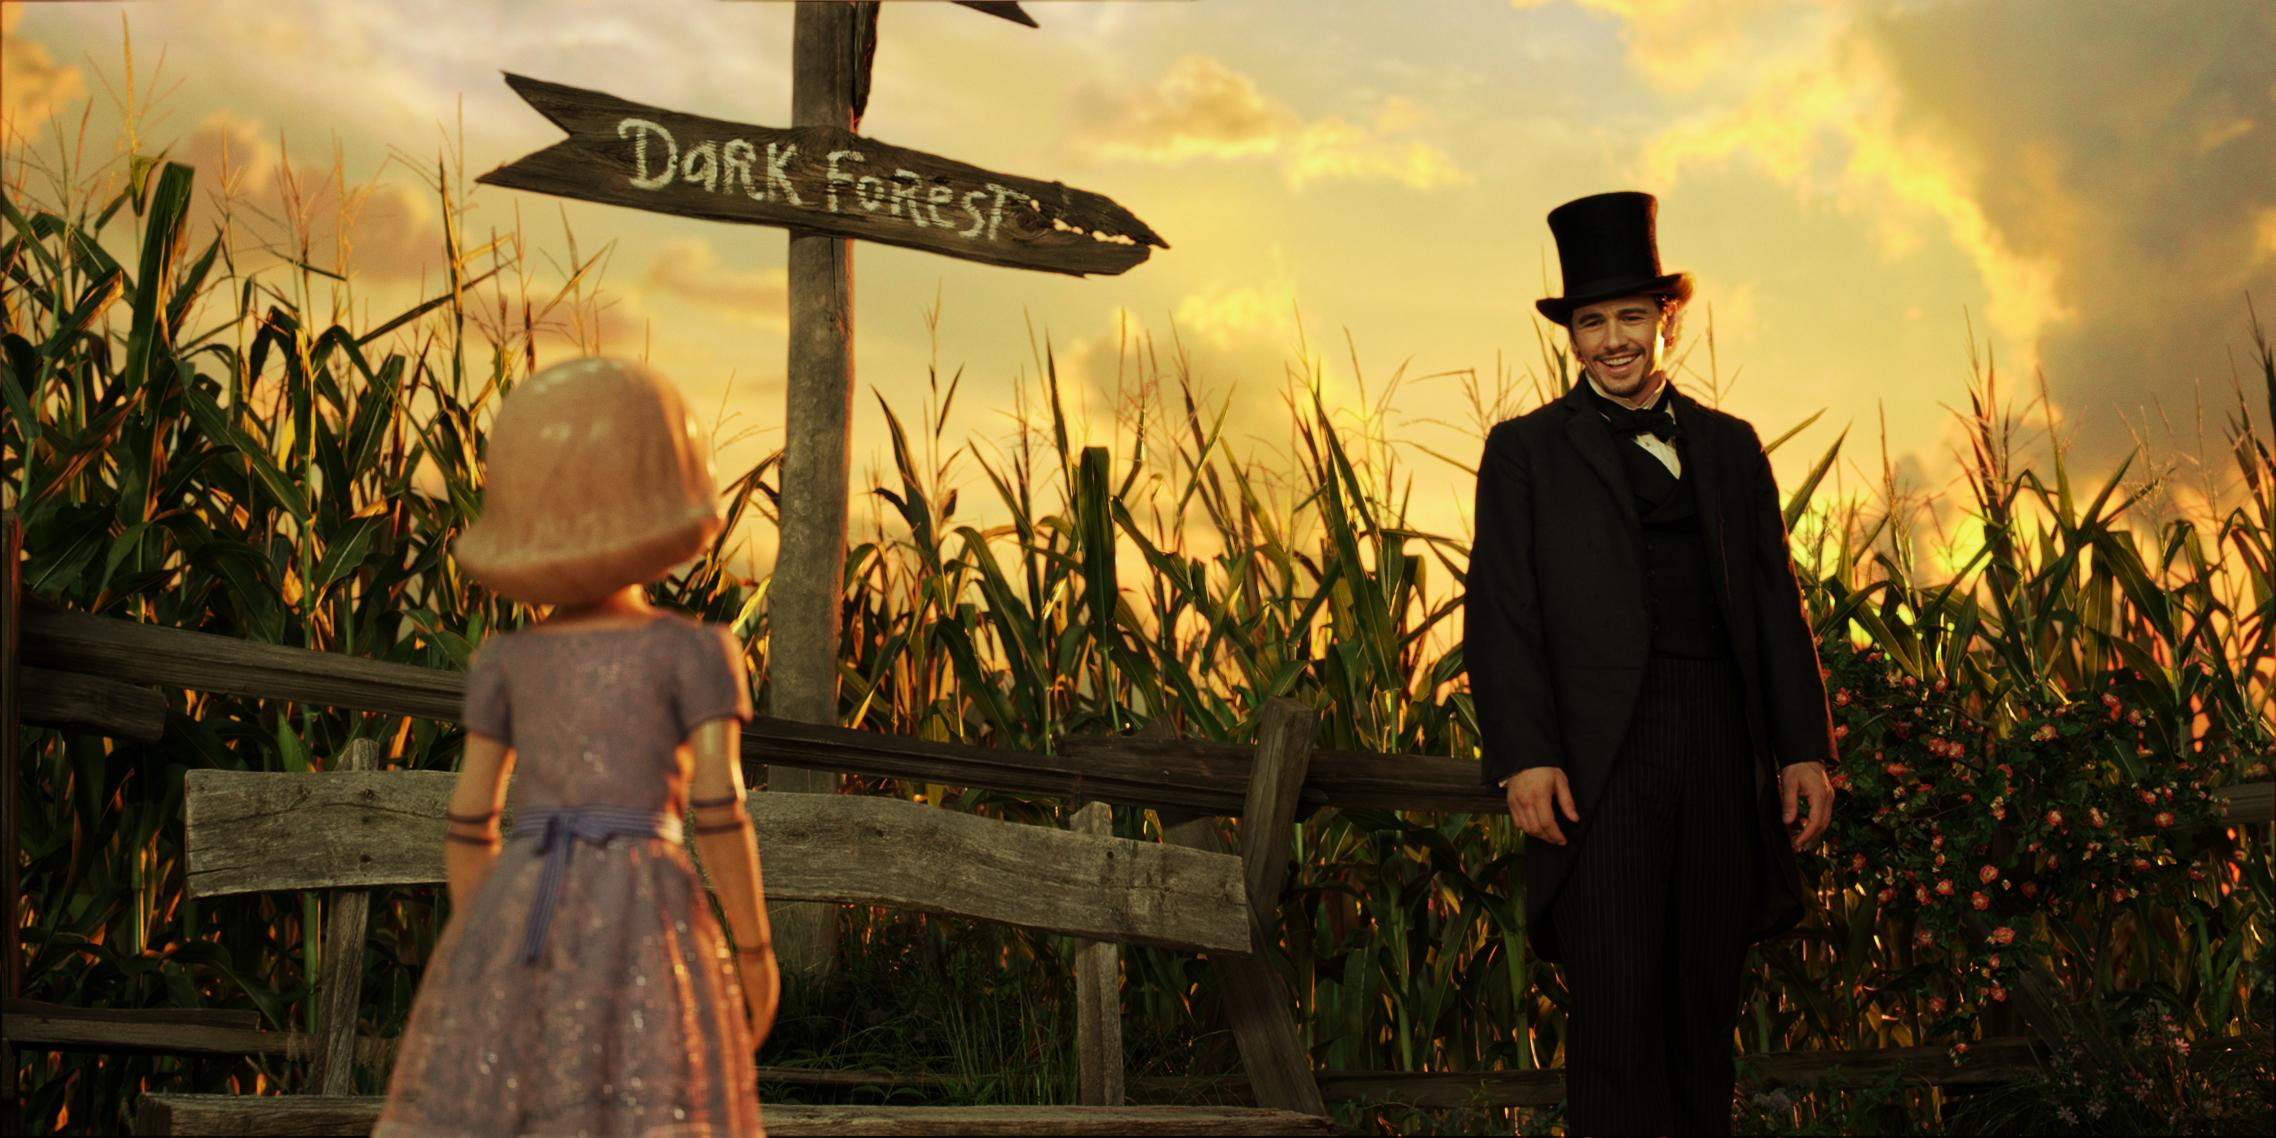 Oz the Great and Powerful (2013) | Anti-Film School Oz The Great And Powerful Cast Oz